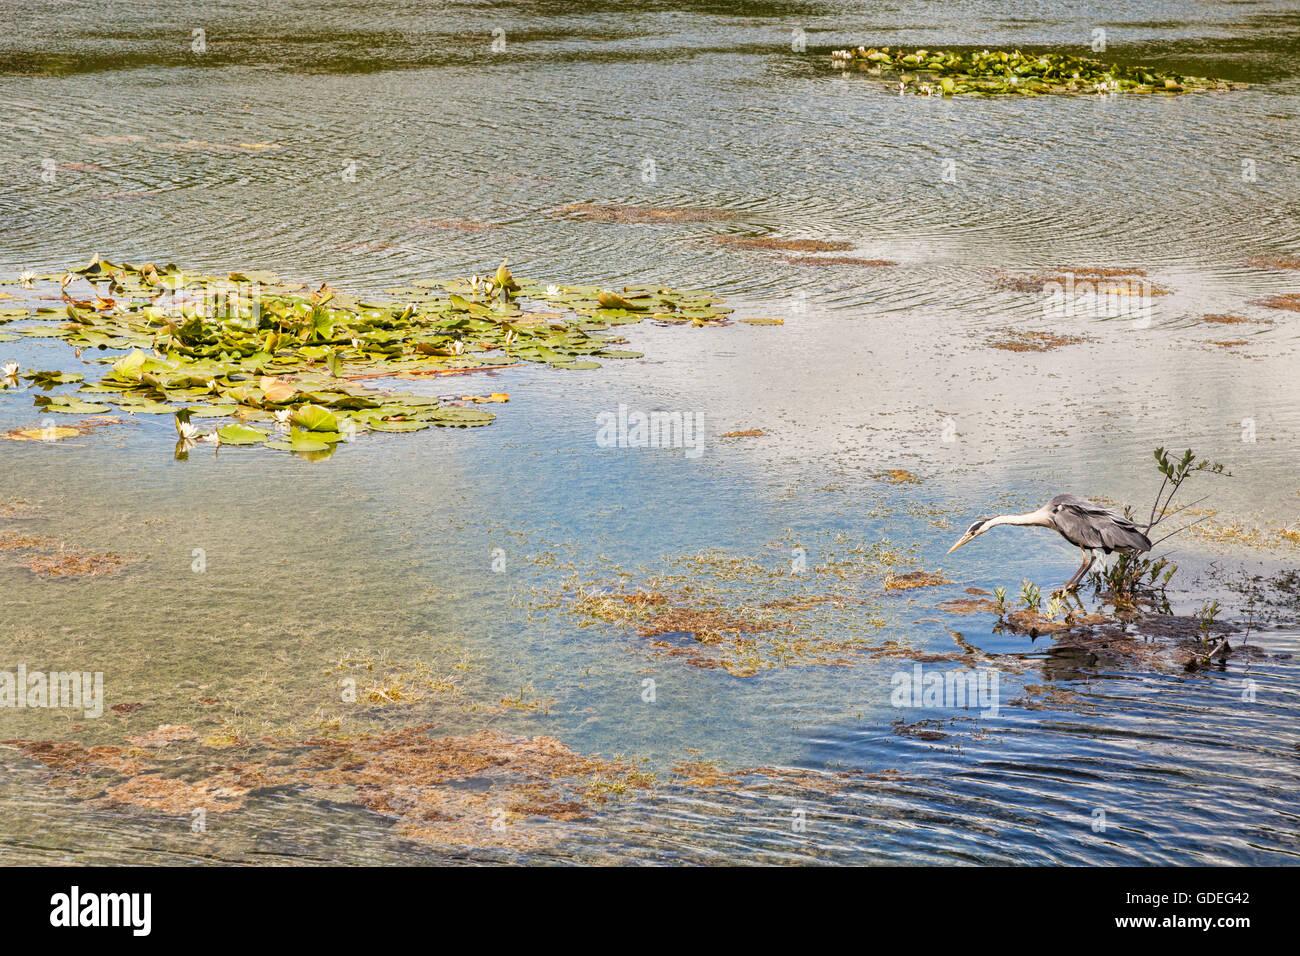 Bosherston Lily Ponds, Stackpole Estate, Pembrokeshire Coast National Park, Wales, UK - Stock Image